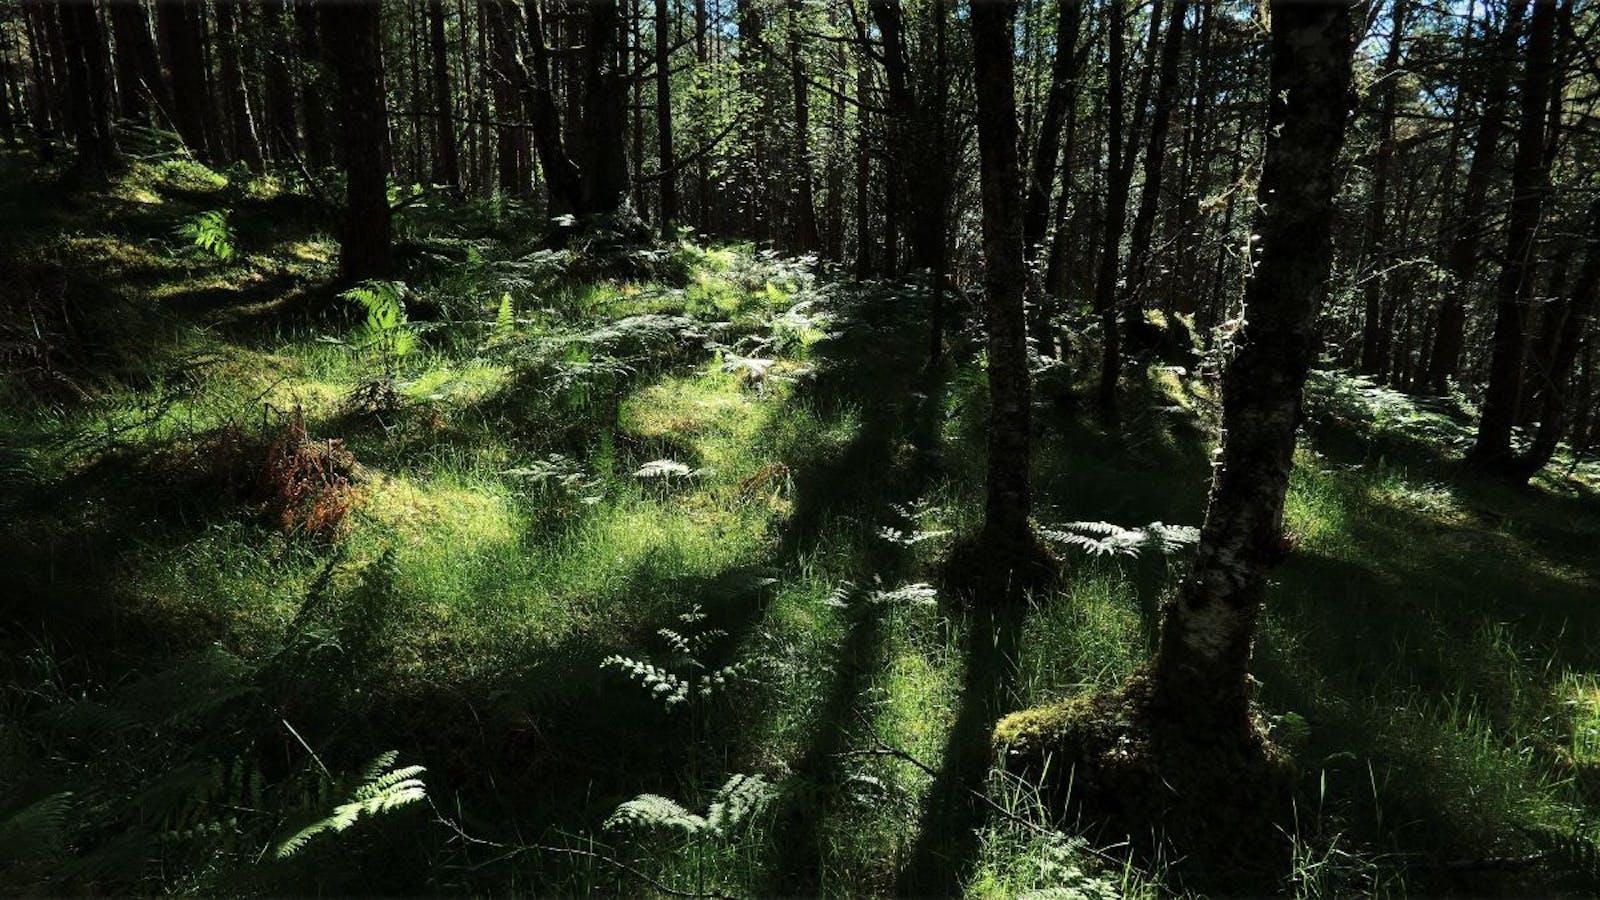 Caledon Conifer Forests